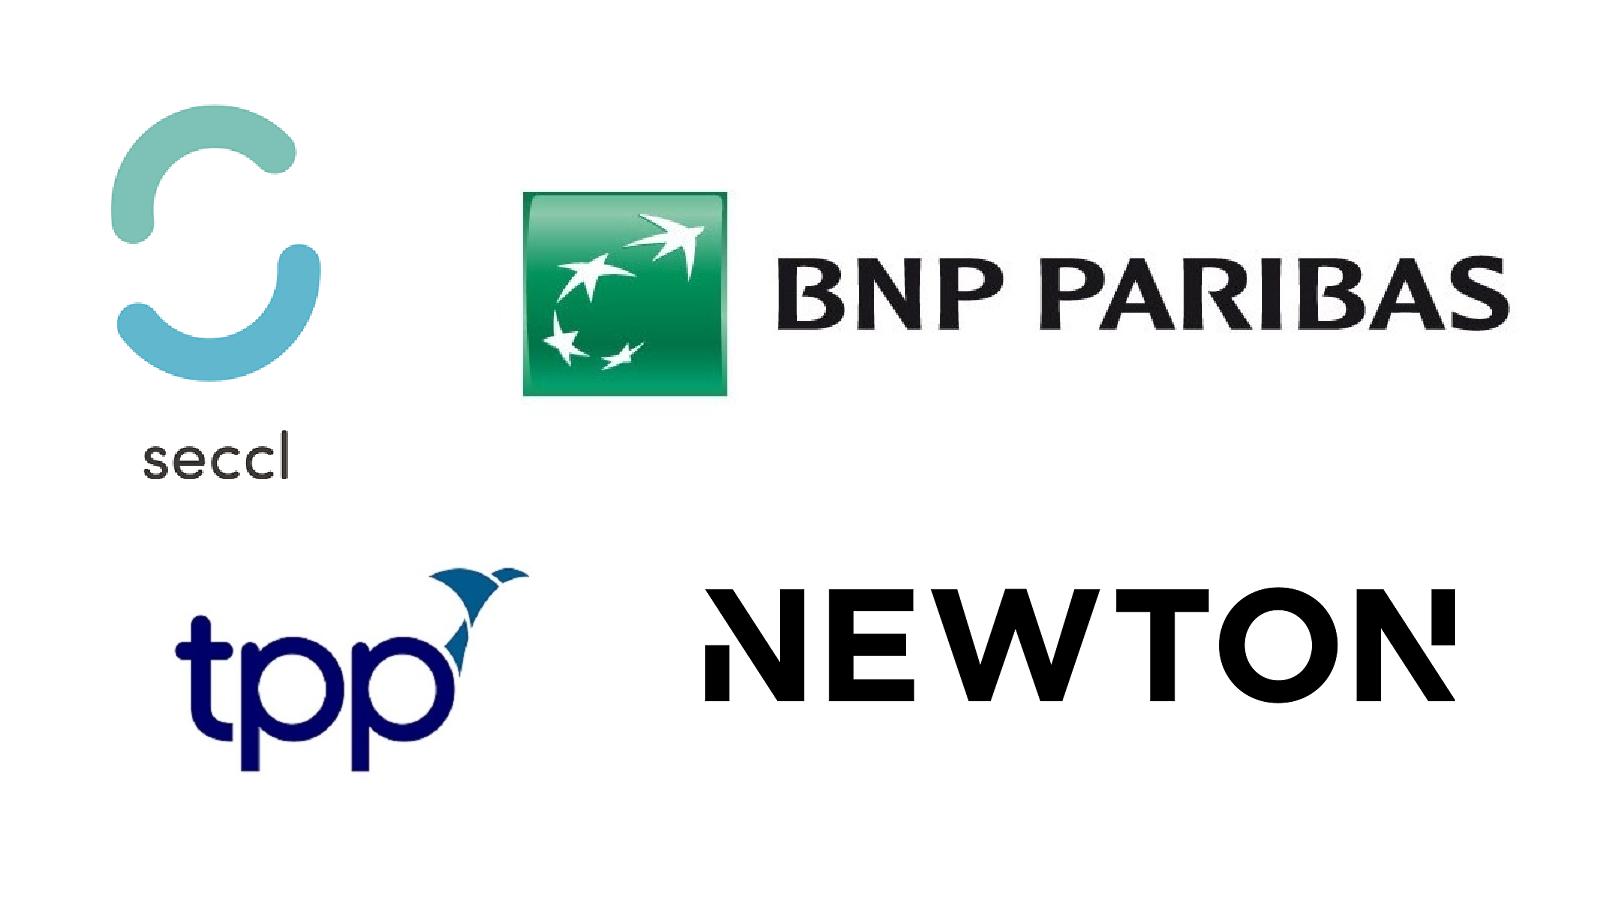 Logos of seccl, BNP Paribas, TPP and Newton